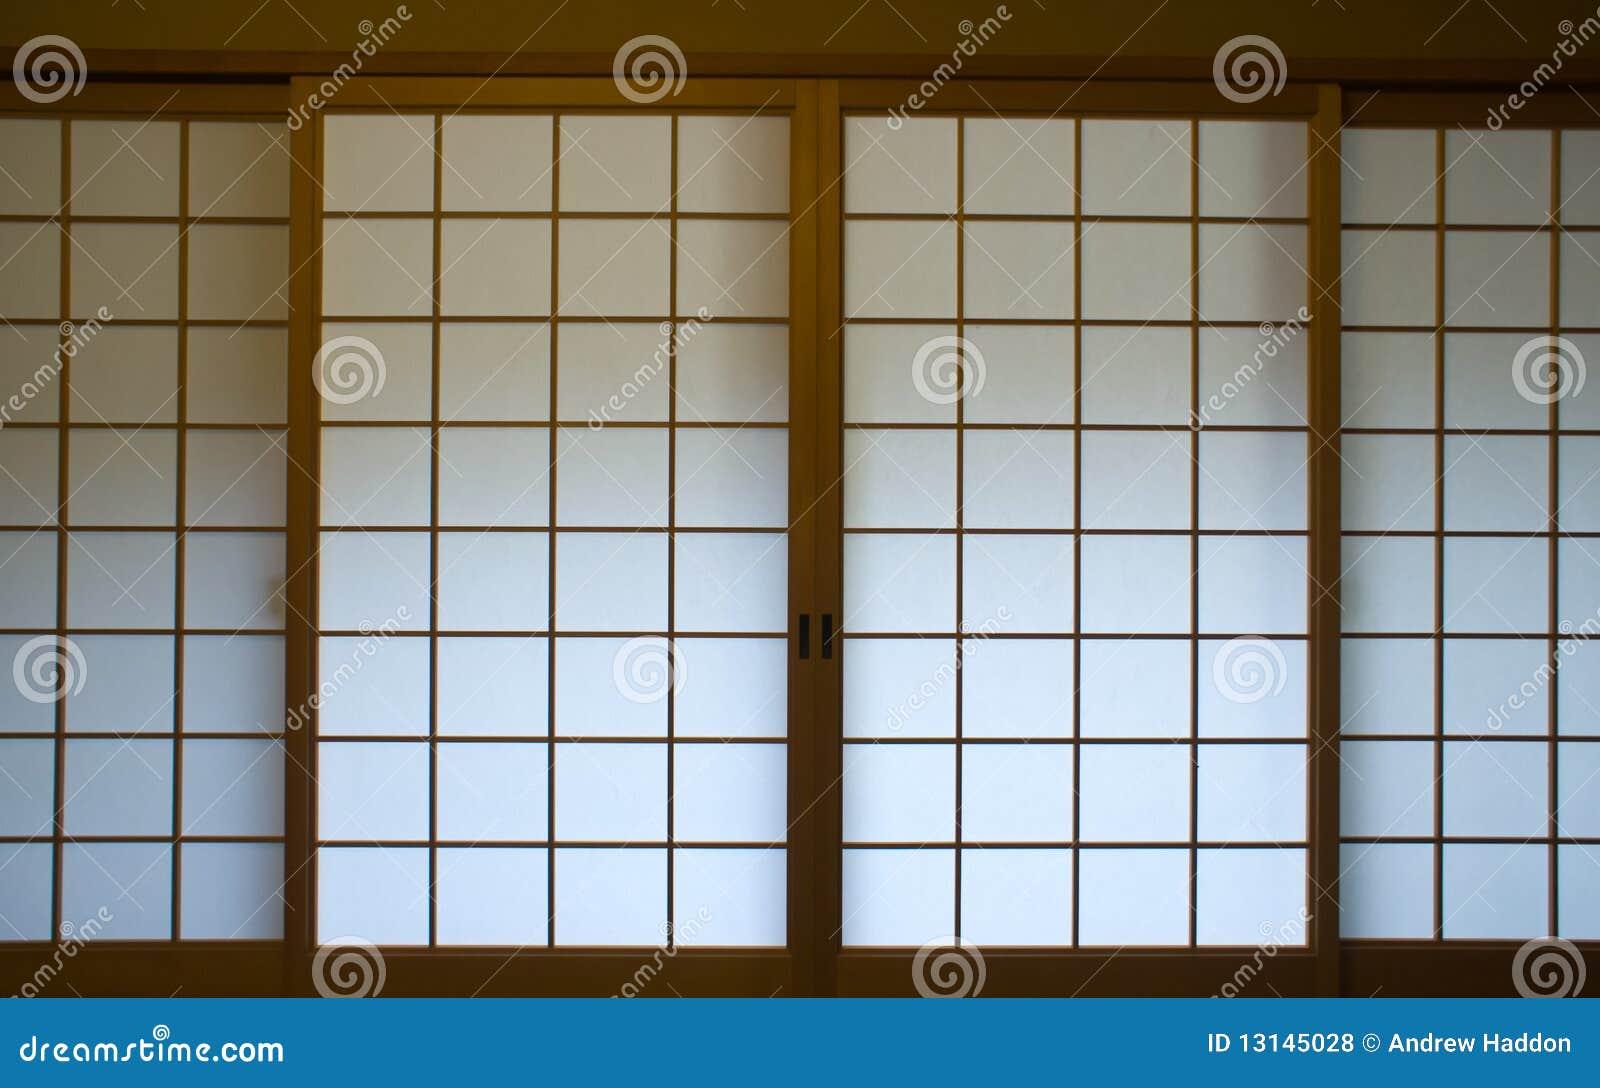 Japanese screen window royalty free stock photos image for Japanese window design